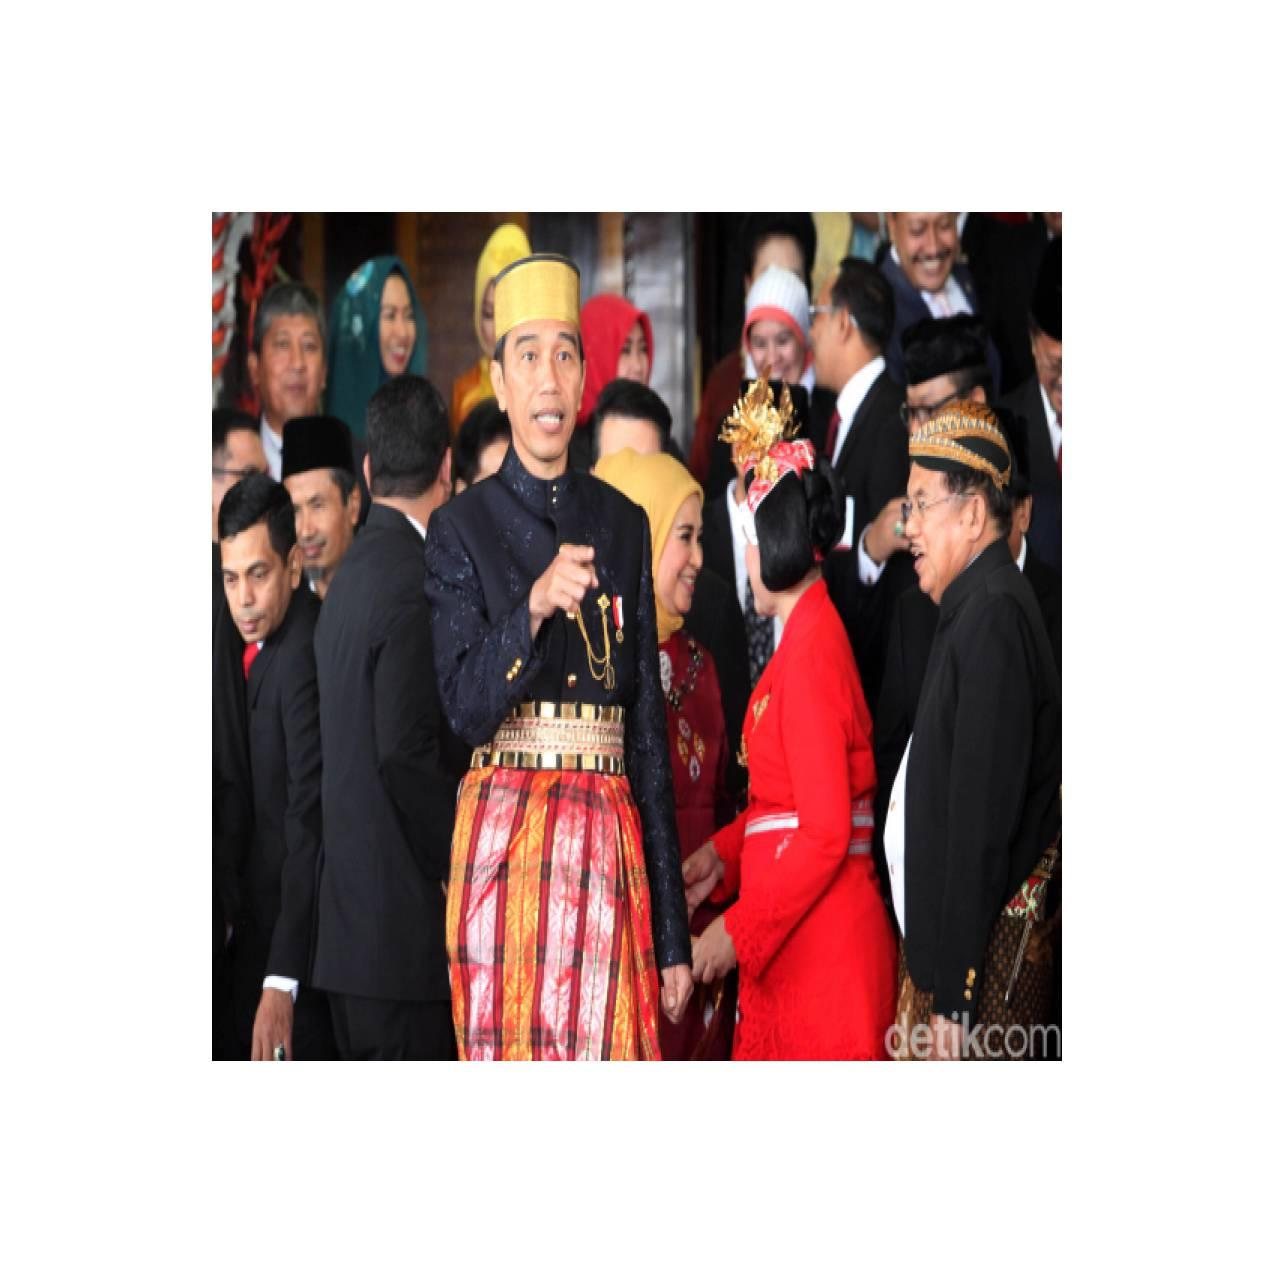 Songkok Bugis Jokowi Pre Order (khusus nomor 11, 11.5 & 12)